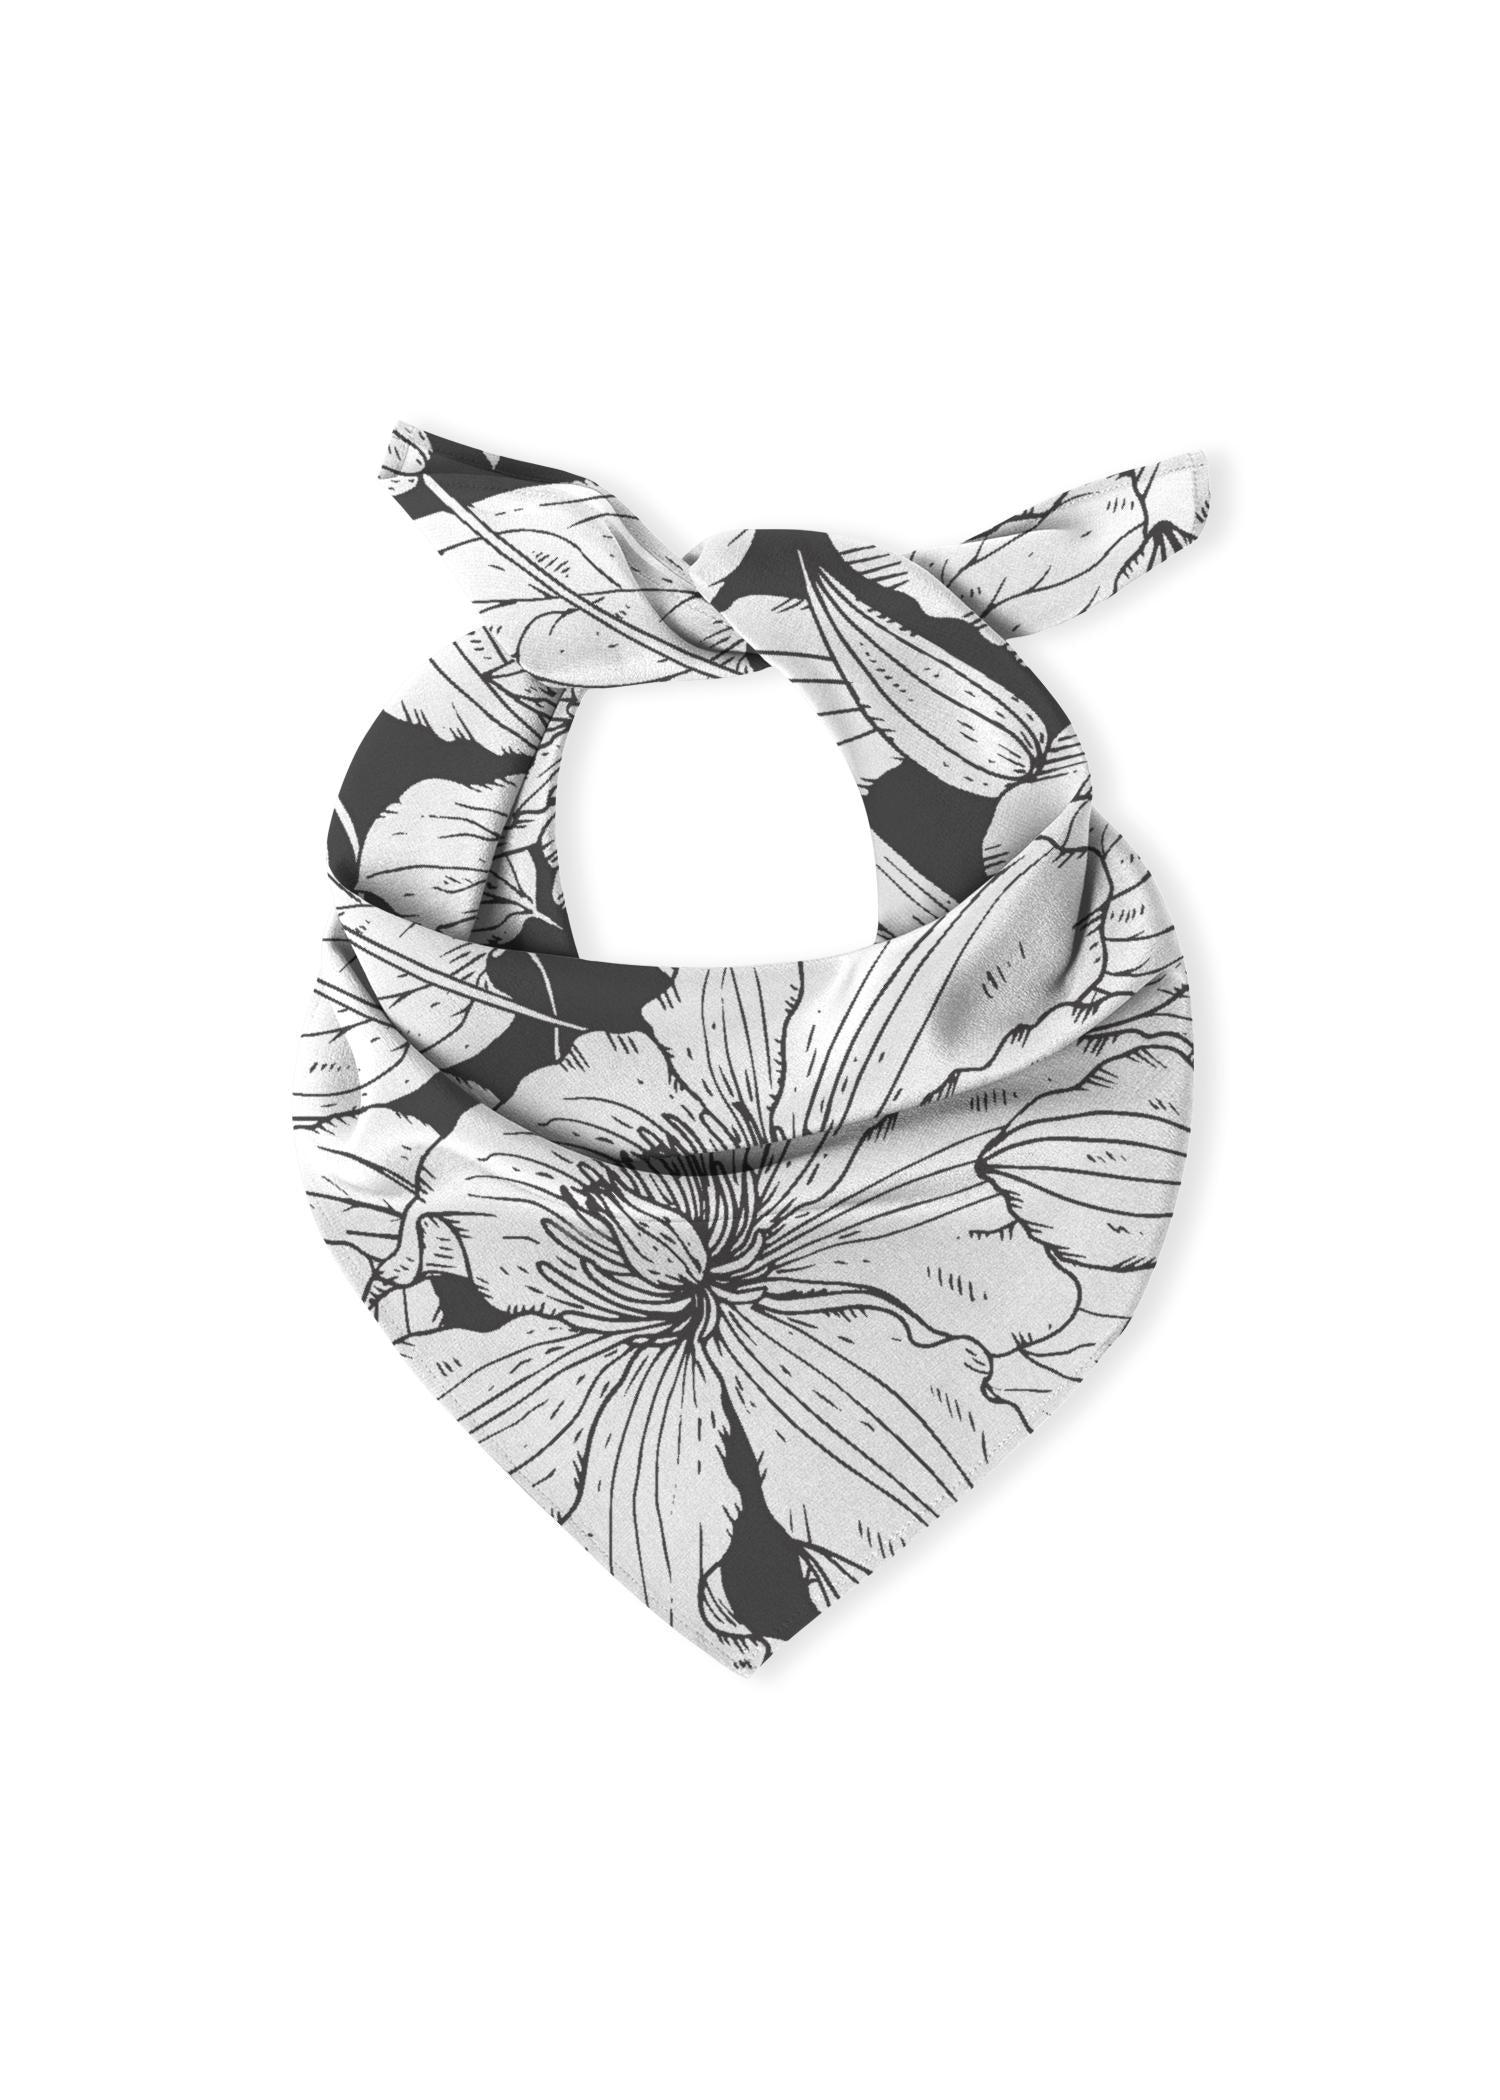 VIDA Multi-Use Cotton Scarf - Black & White Garden by VIDA Original Artist  - Size: Cotton